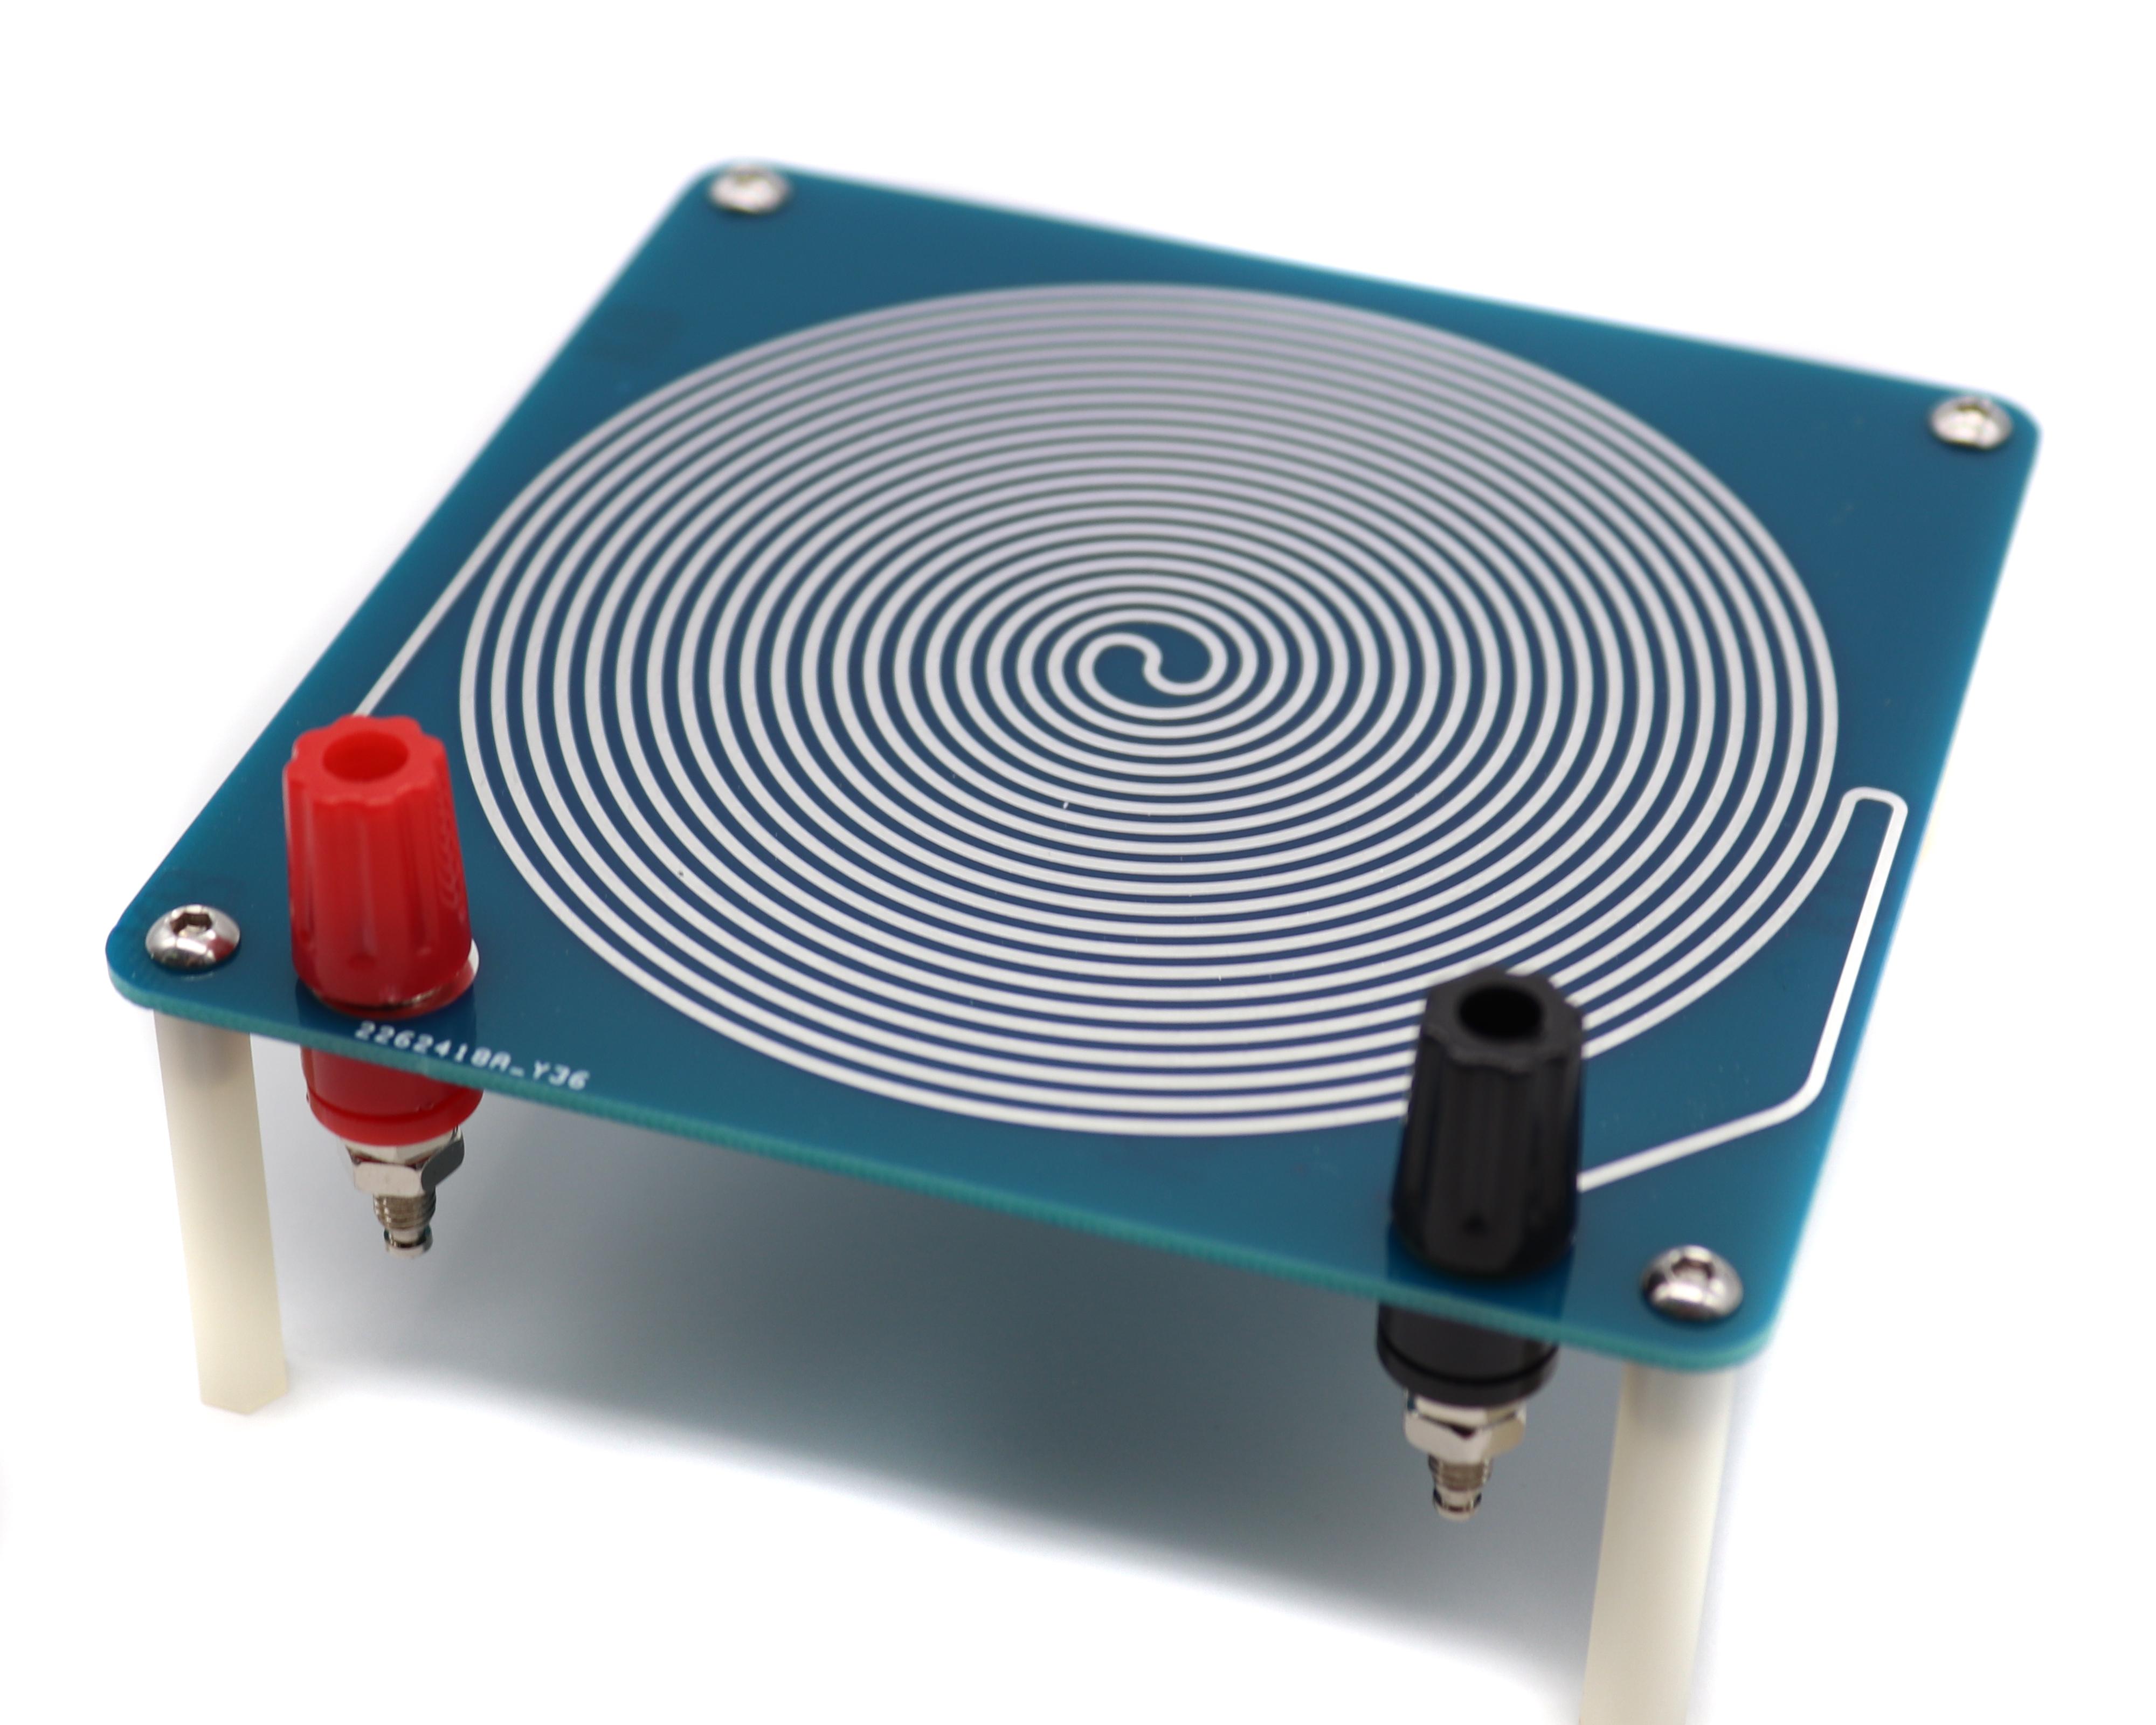 Scalar wave modular system